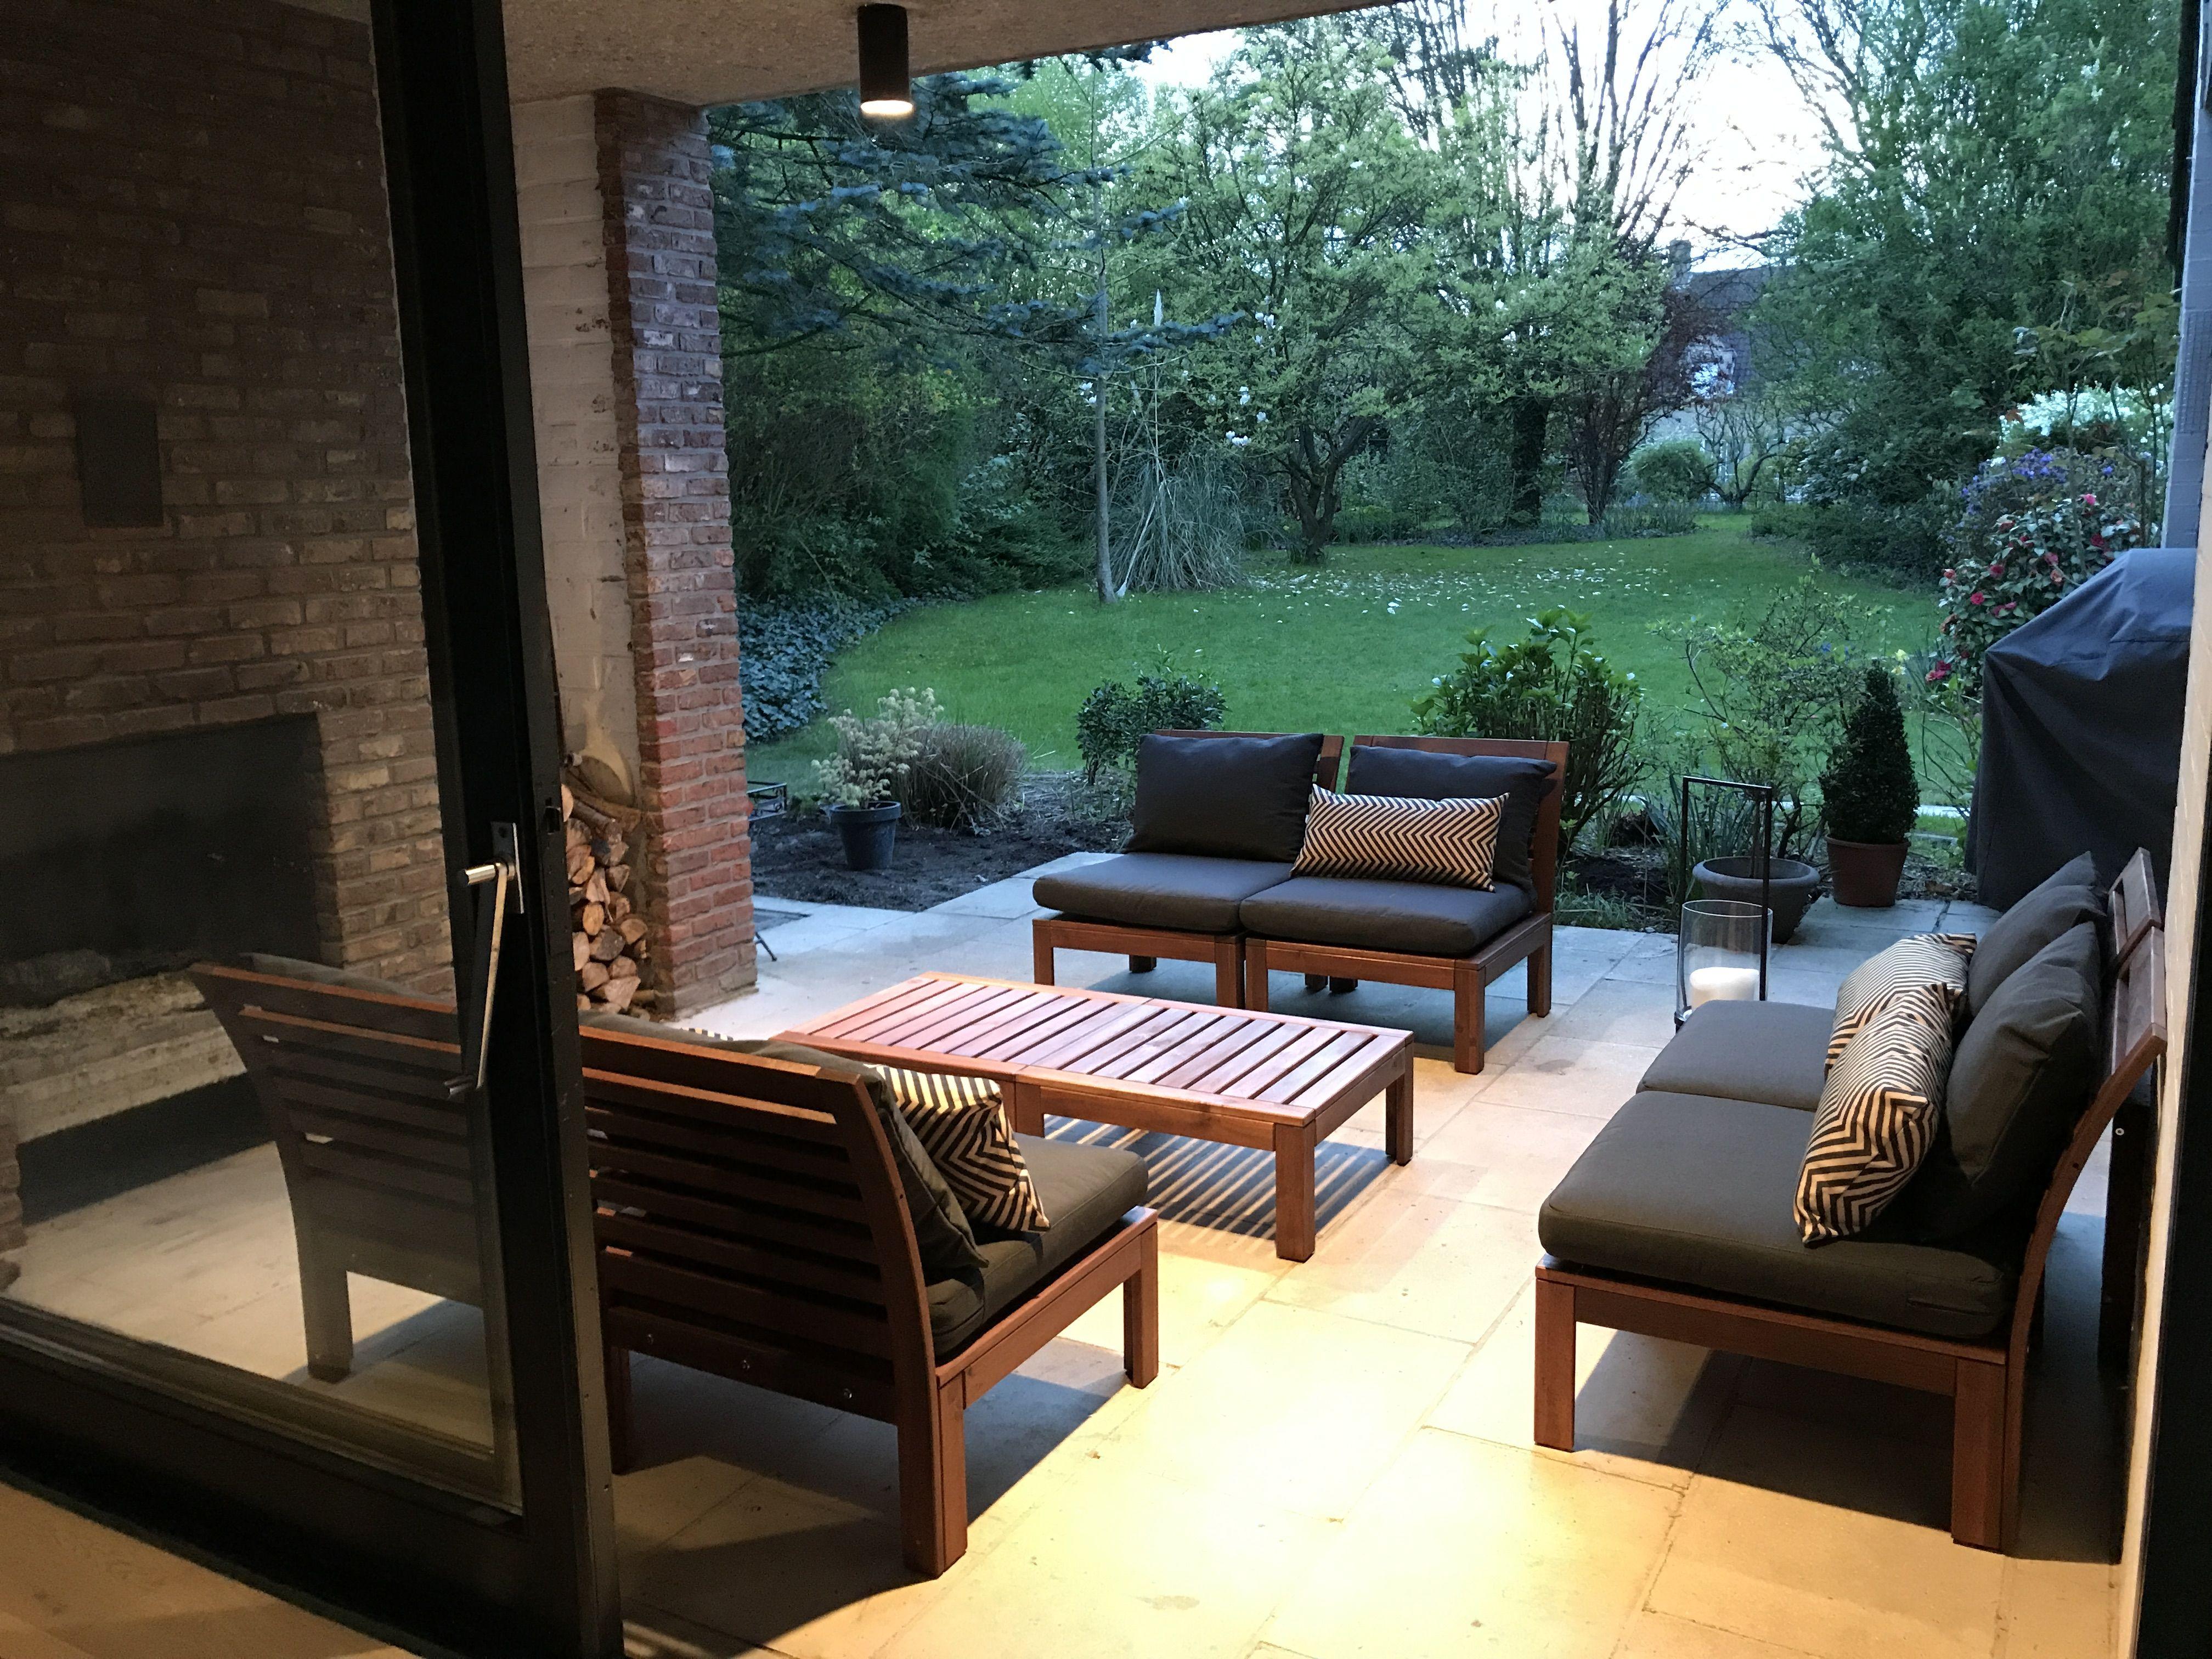 Ikea Applaro Summer 2107 Ikea Patio Rustic Outdoor Furniture Ikea Patio Furniture #outdoor #living #room #set